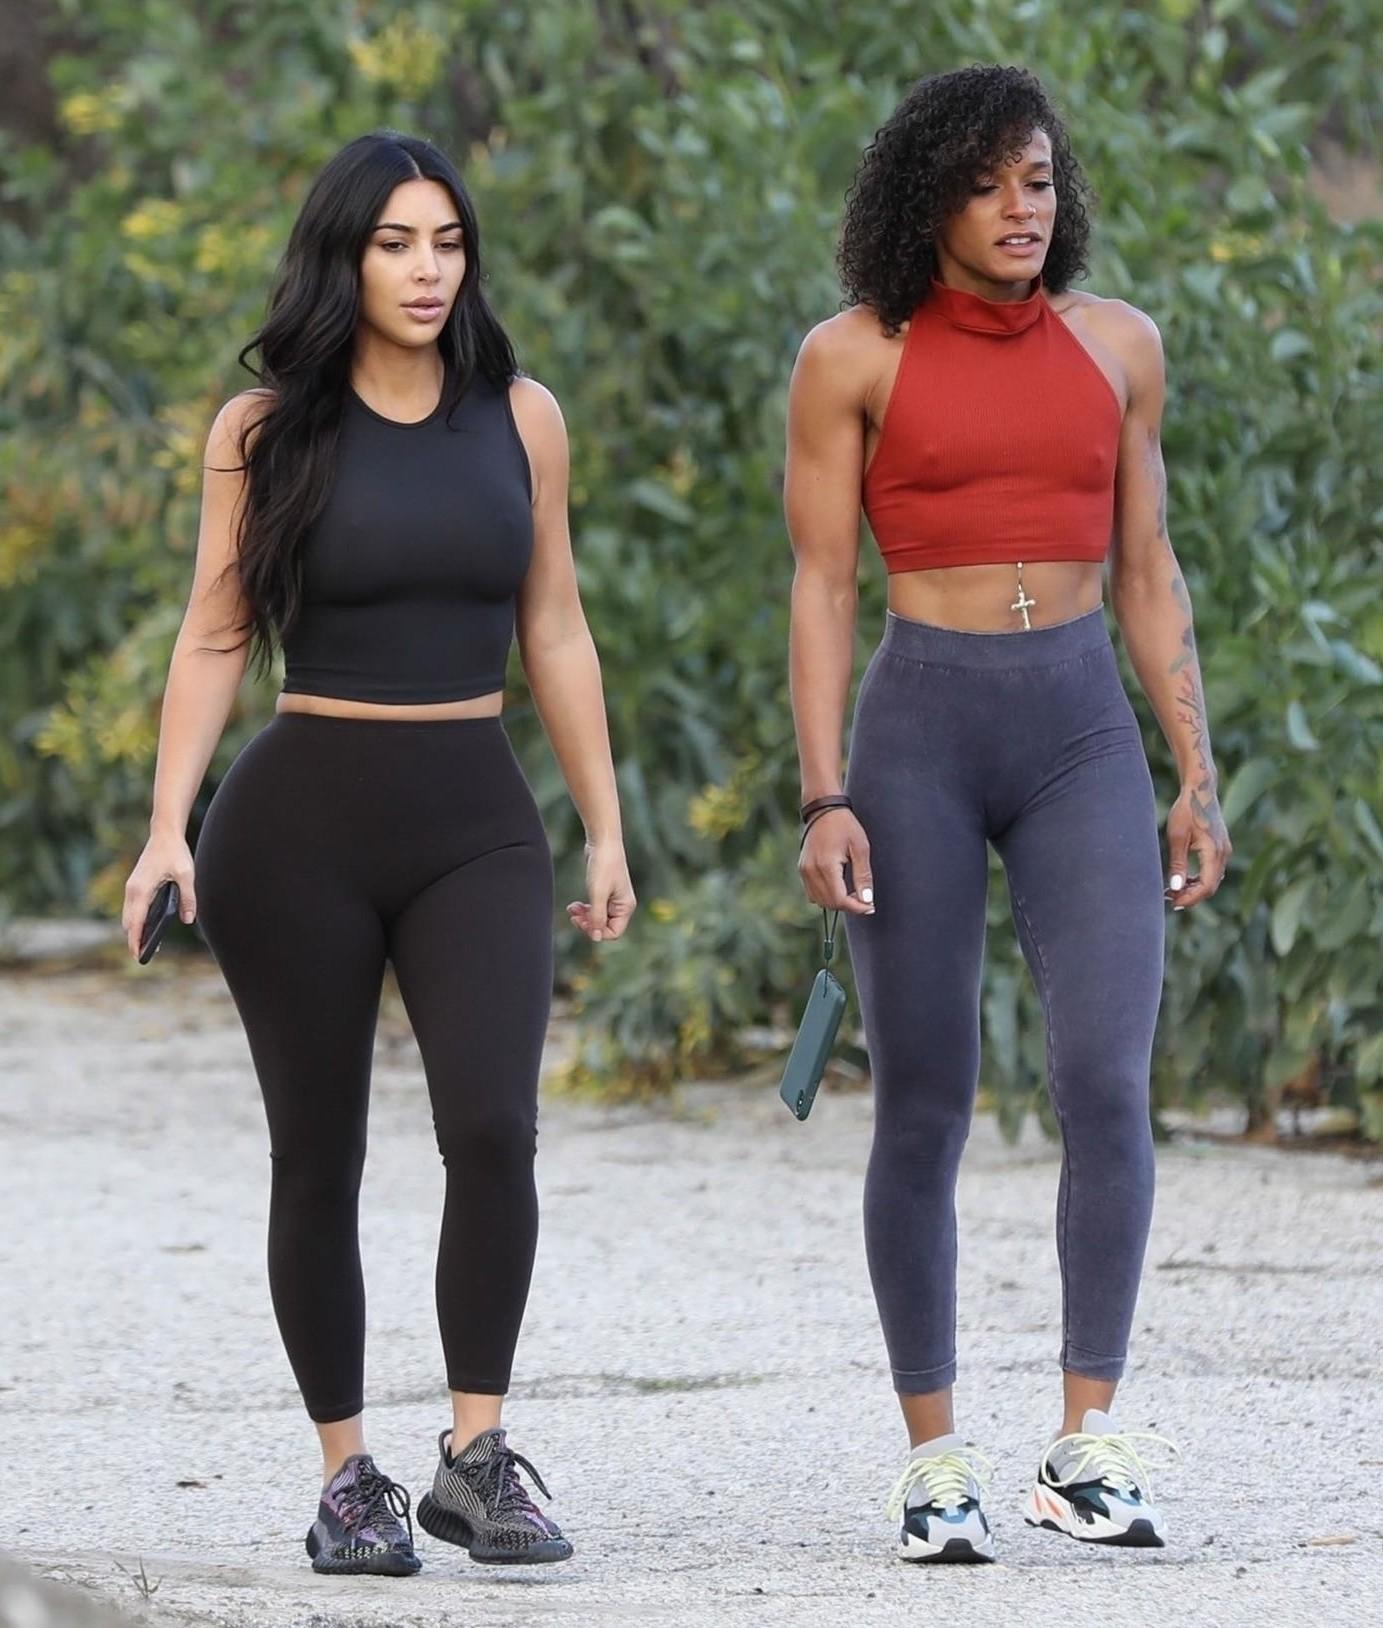 Kim Kardashian Big Ass In Leggings